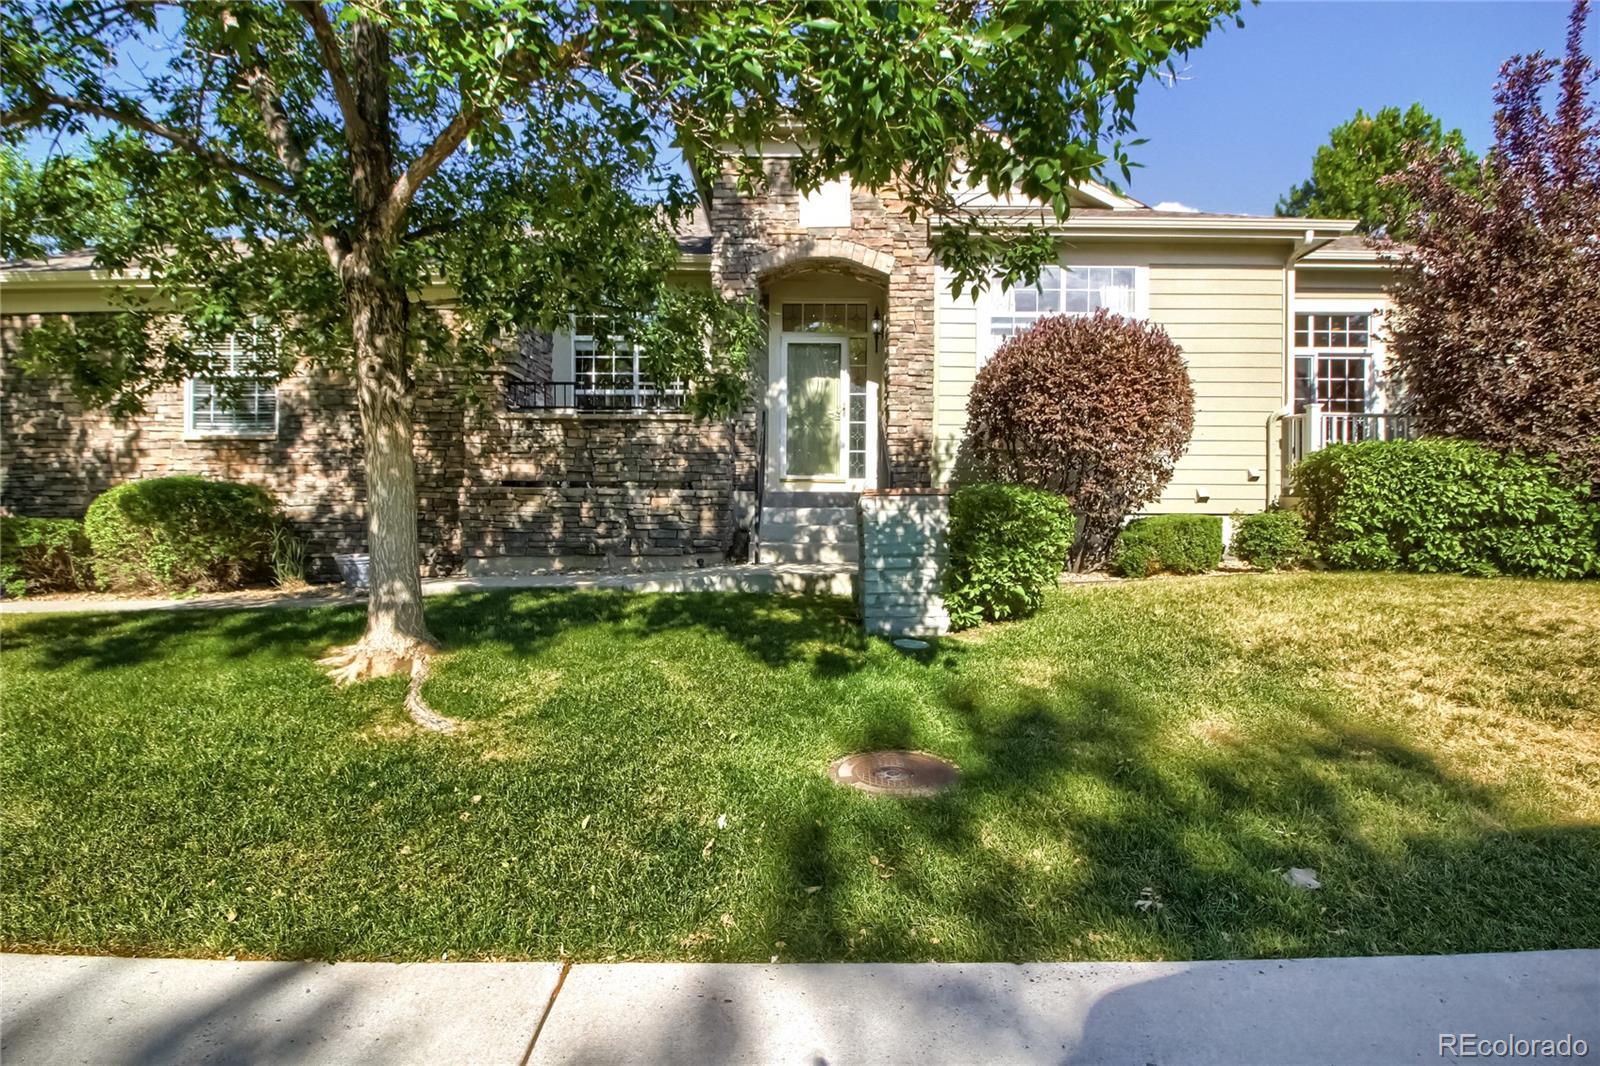 3897 E 127th Lane Property Photo - Thornton, CO real estate listing